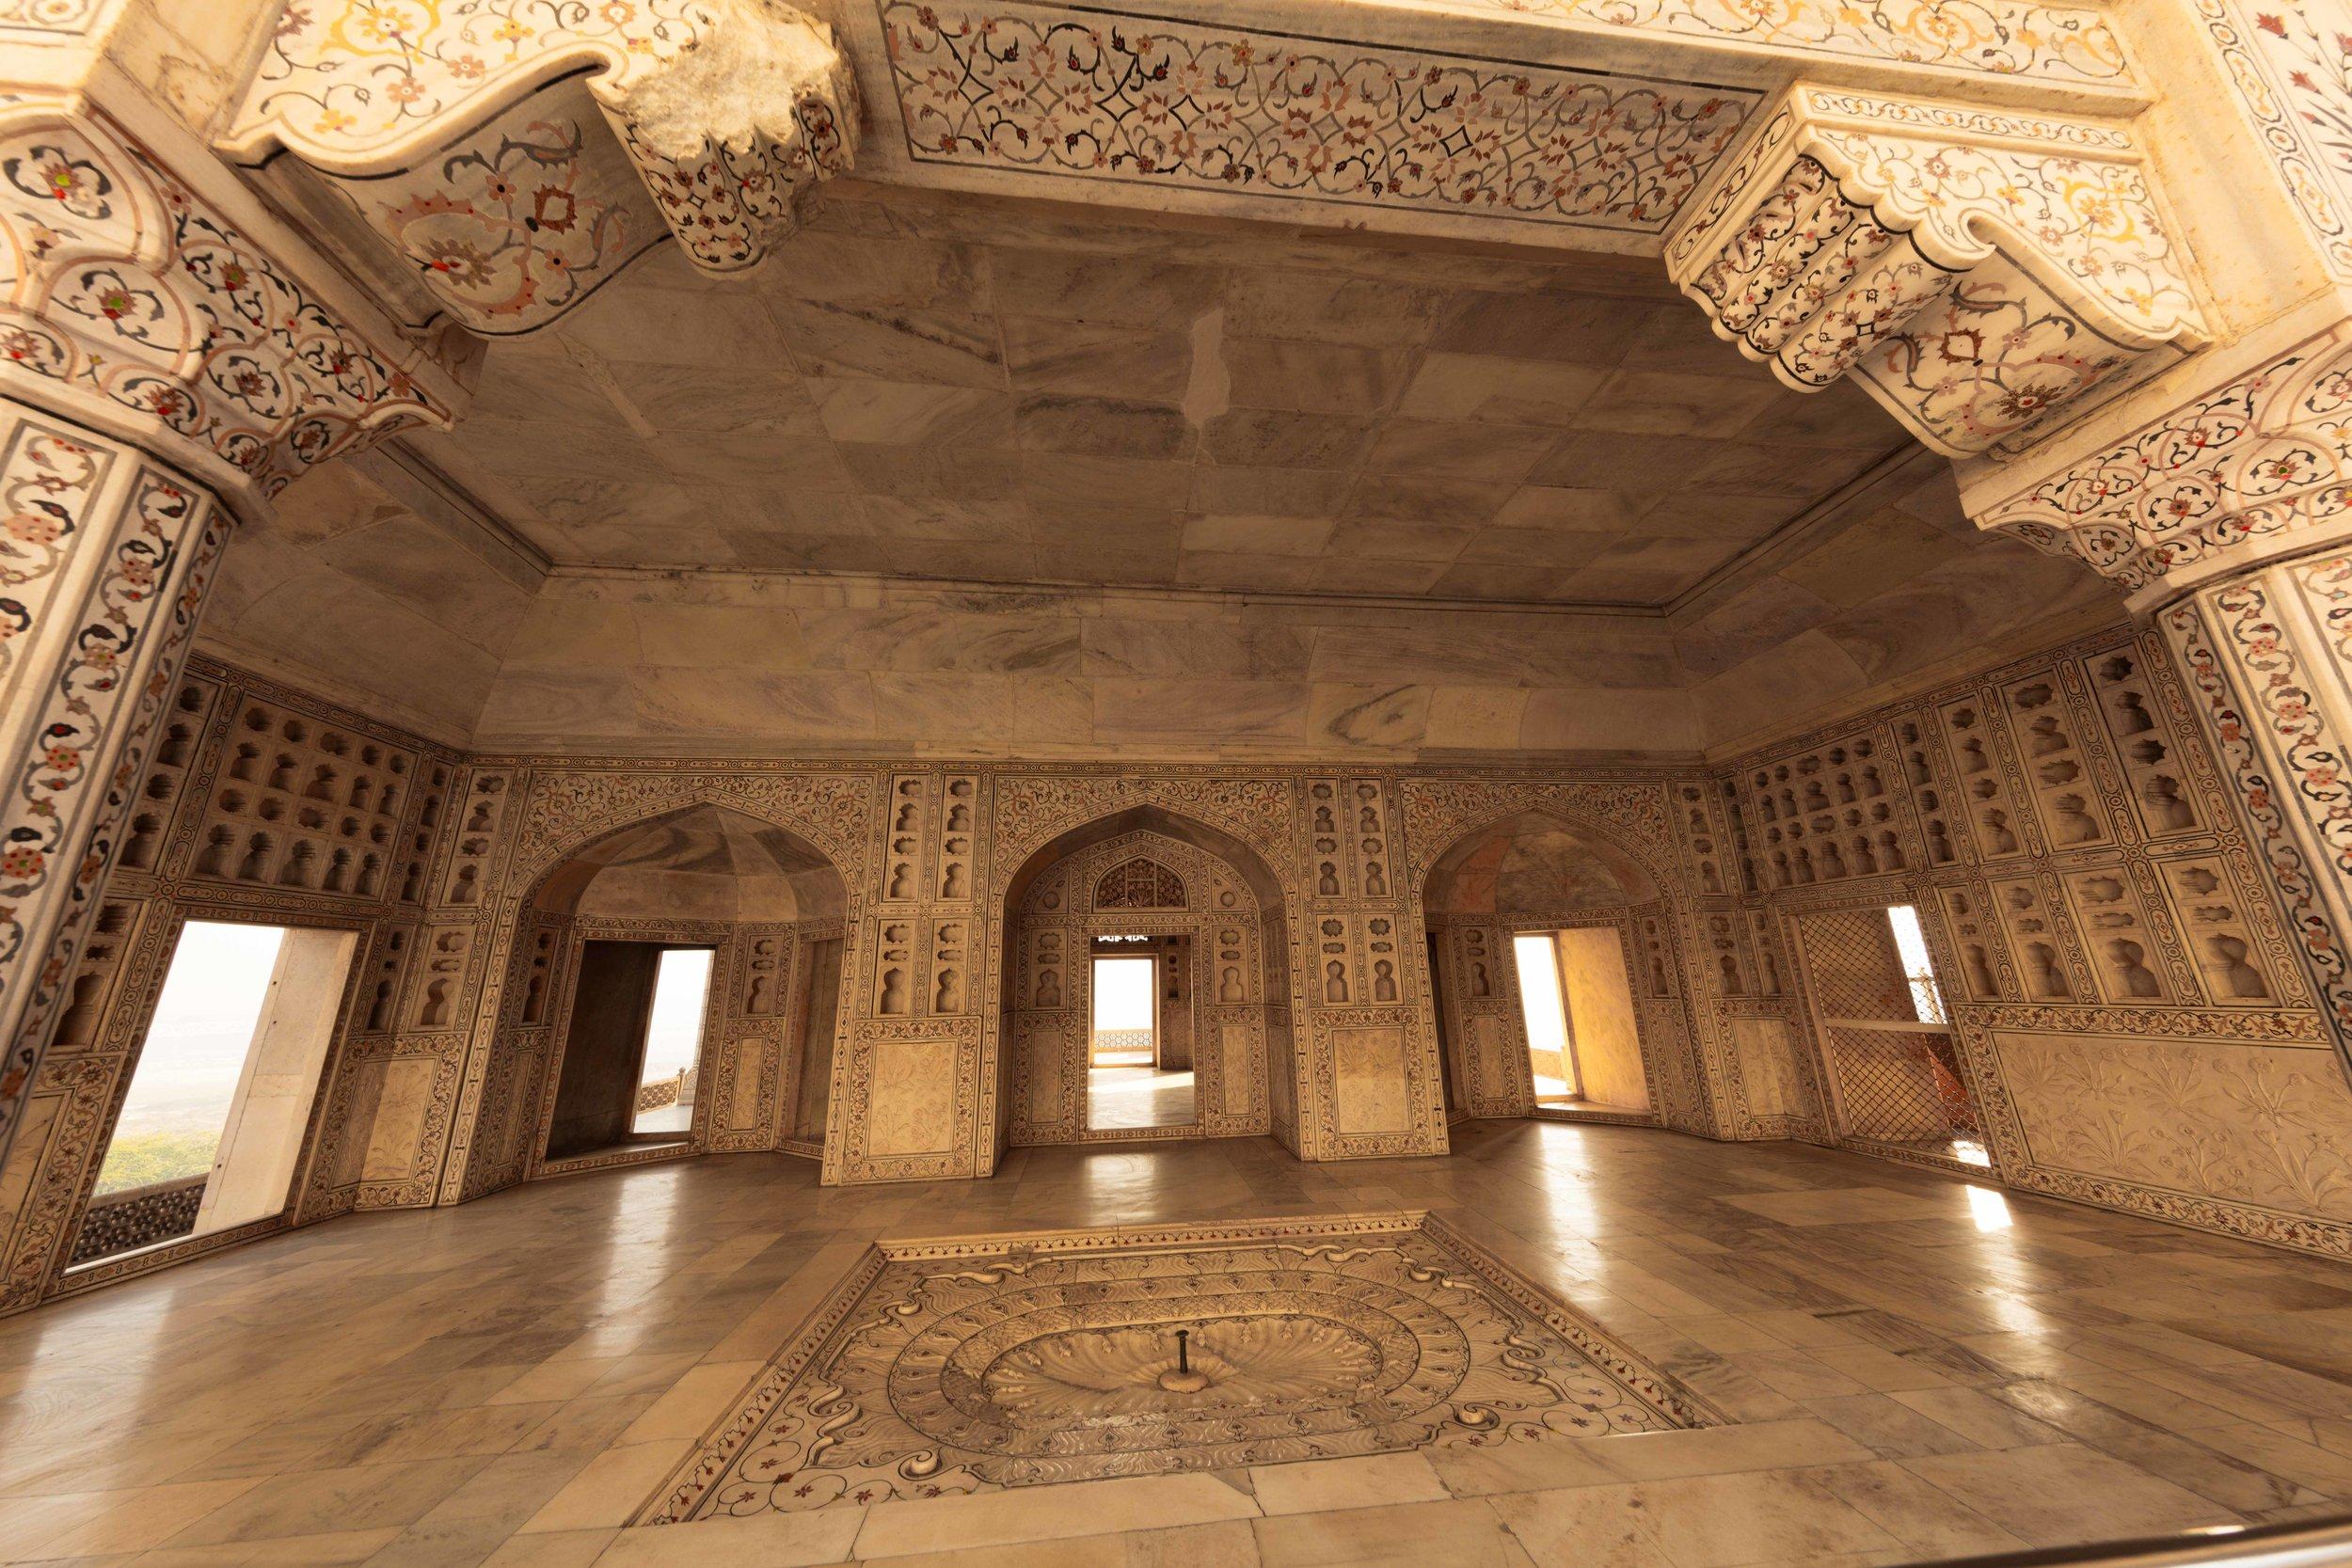 Mussaman Burj, Agra Fort